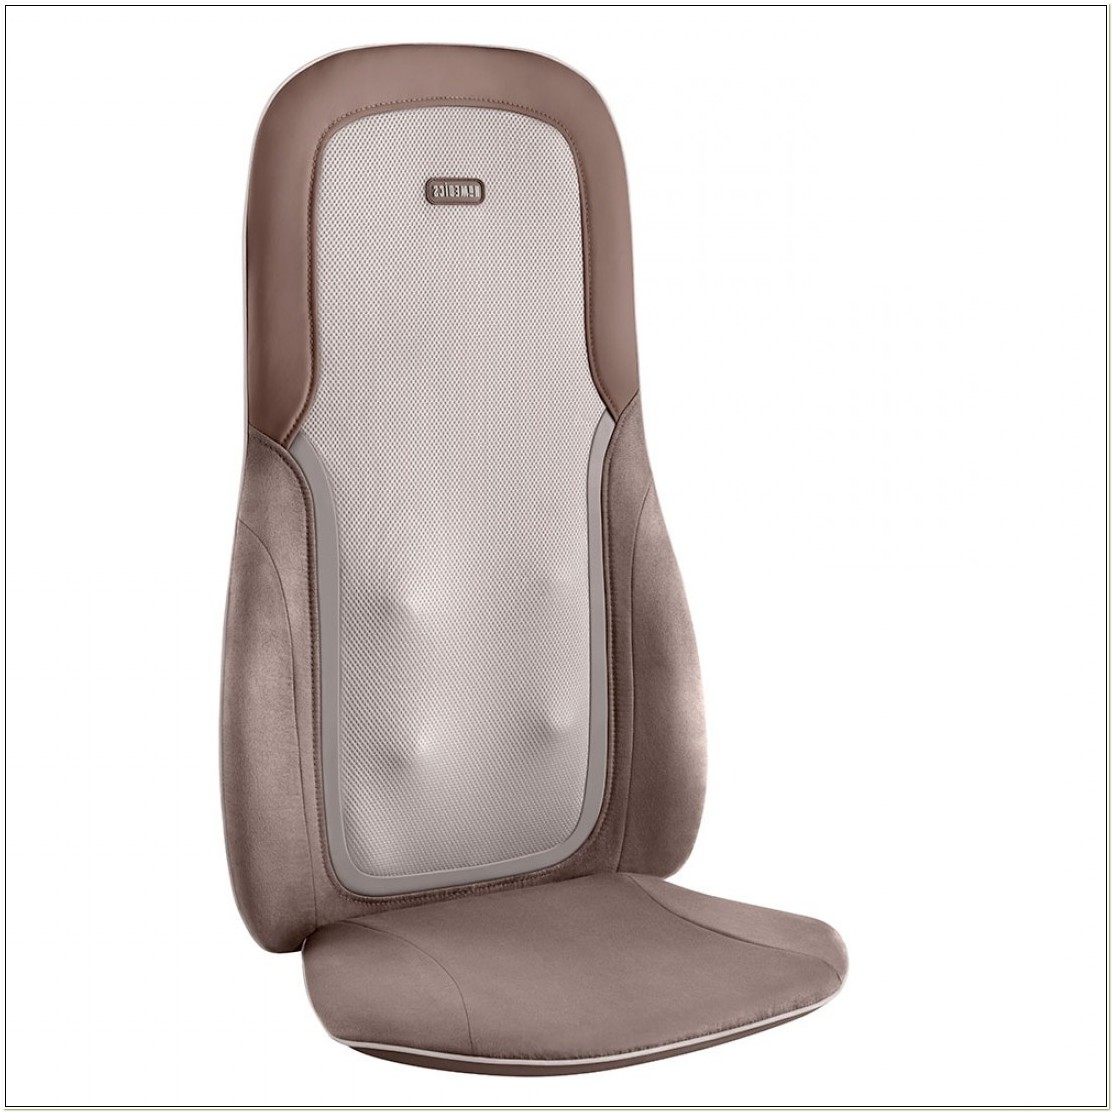 Homedics Dual Shiatsu Massage Chair Cushion